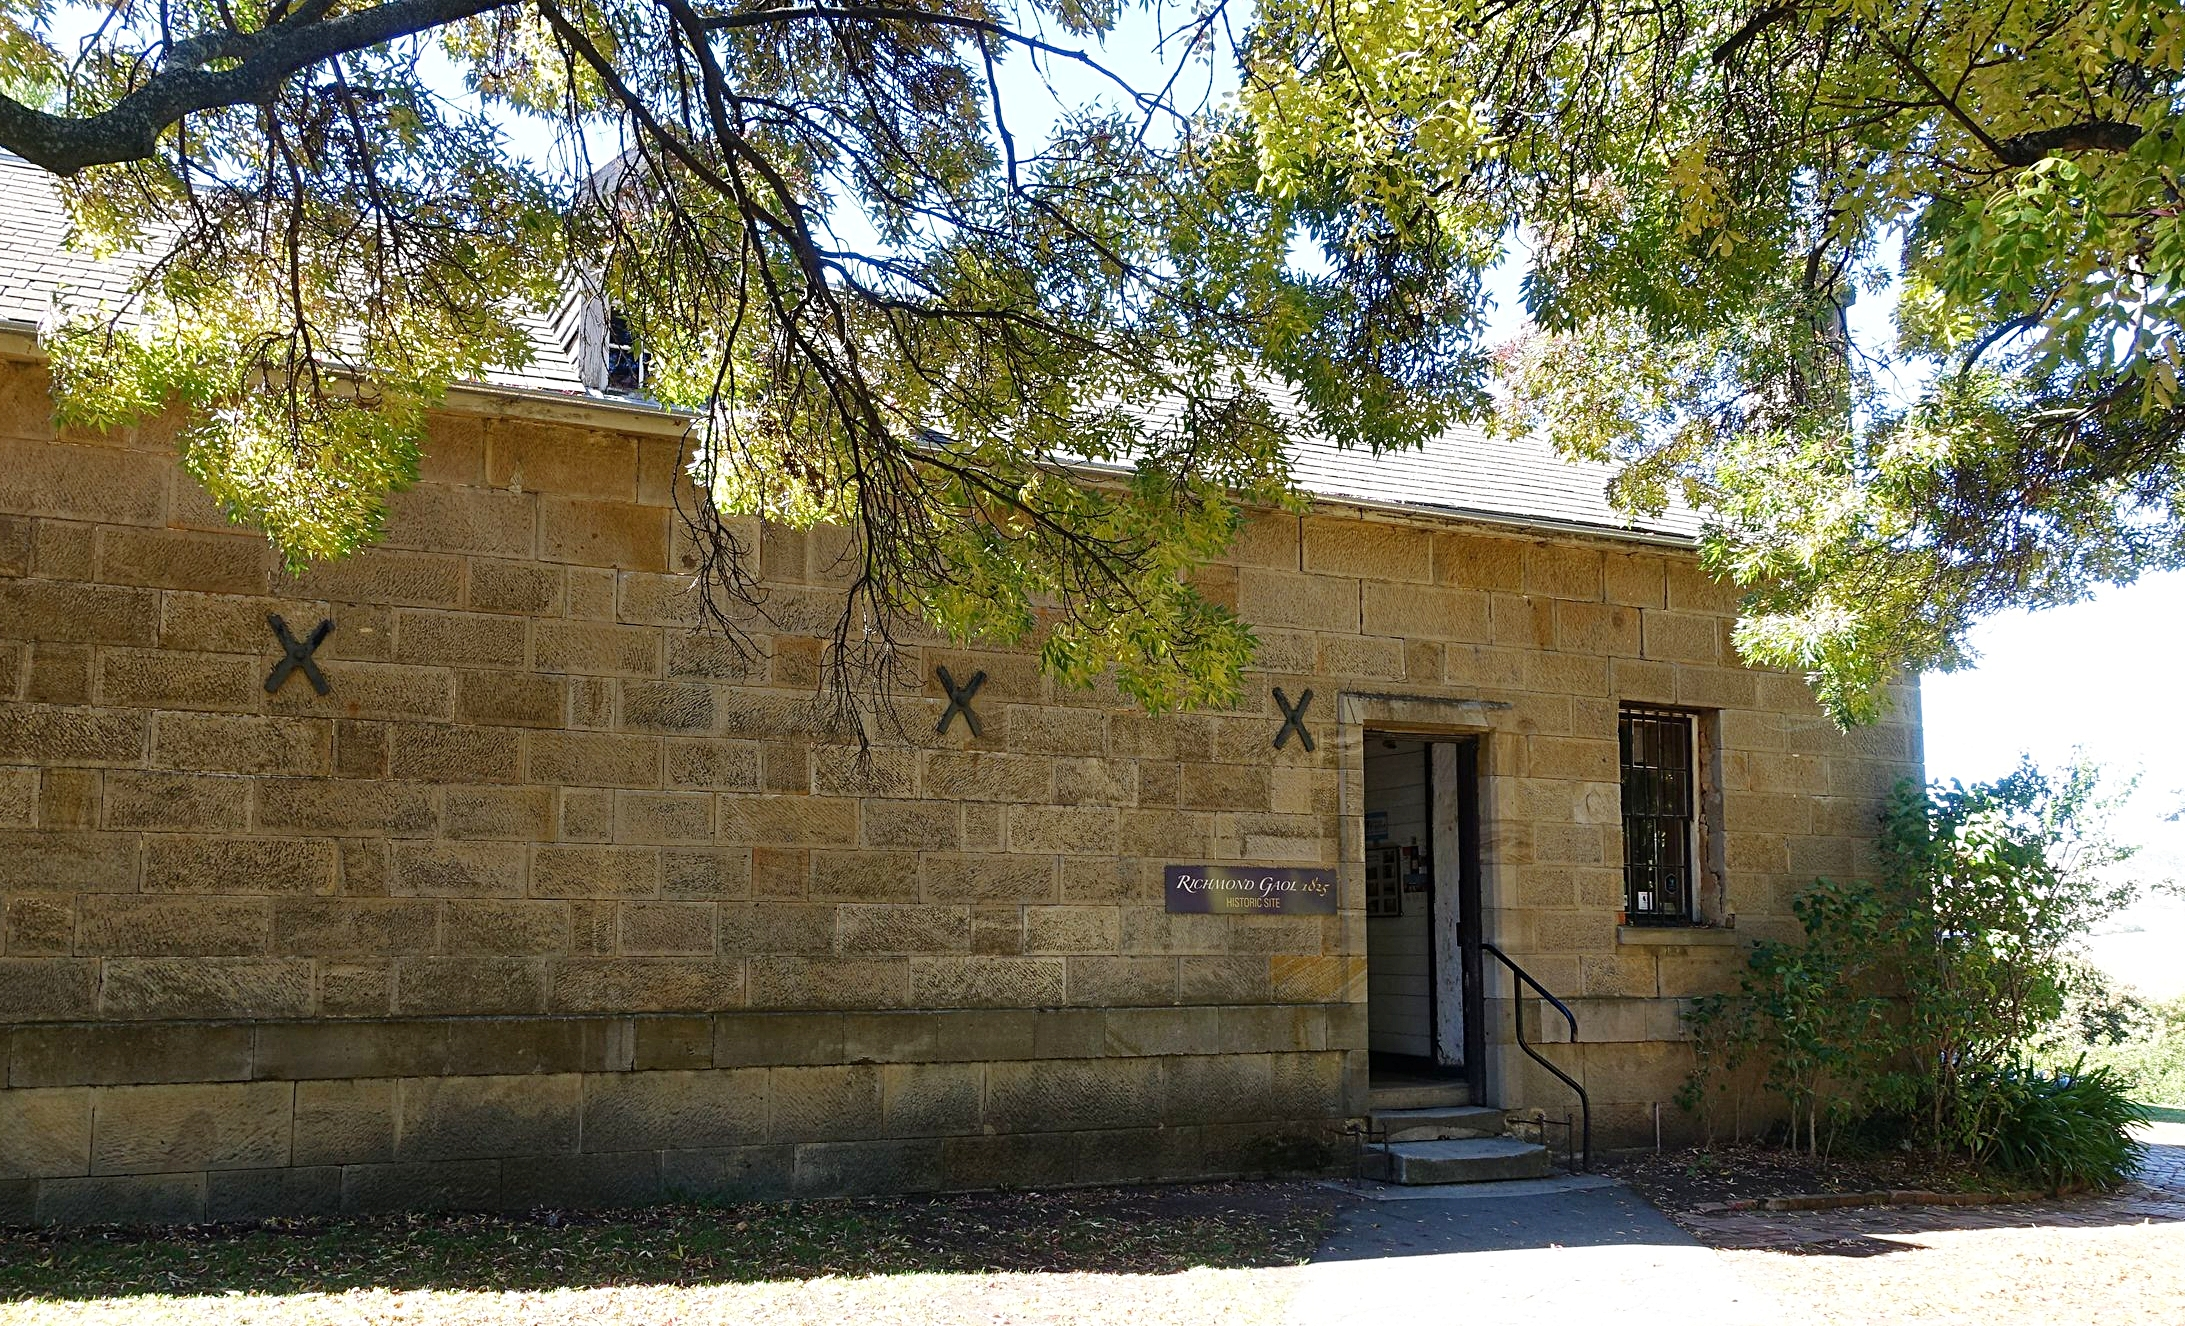 Richmond gaol historic site